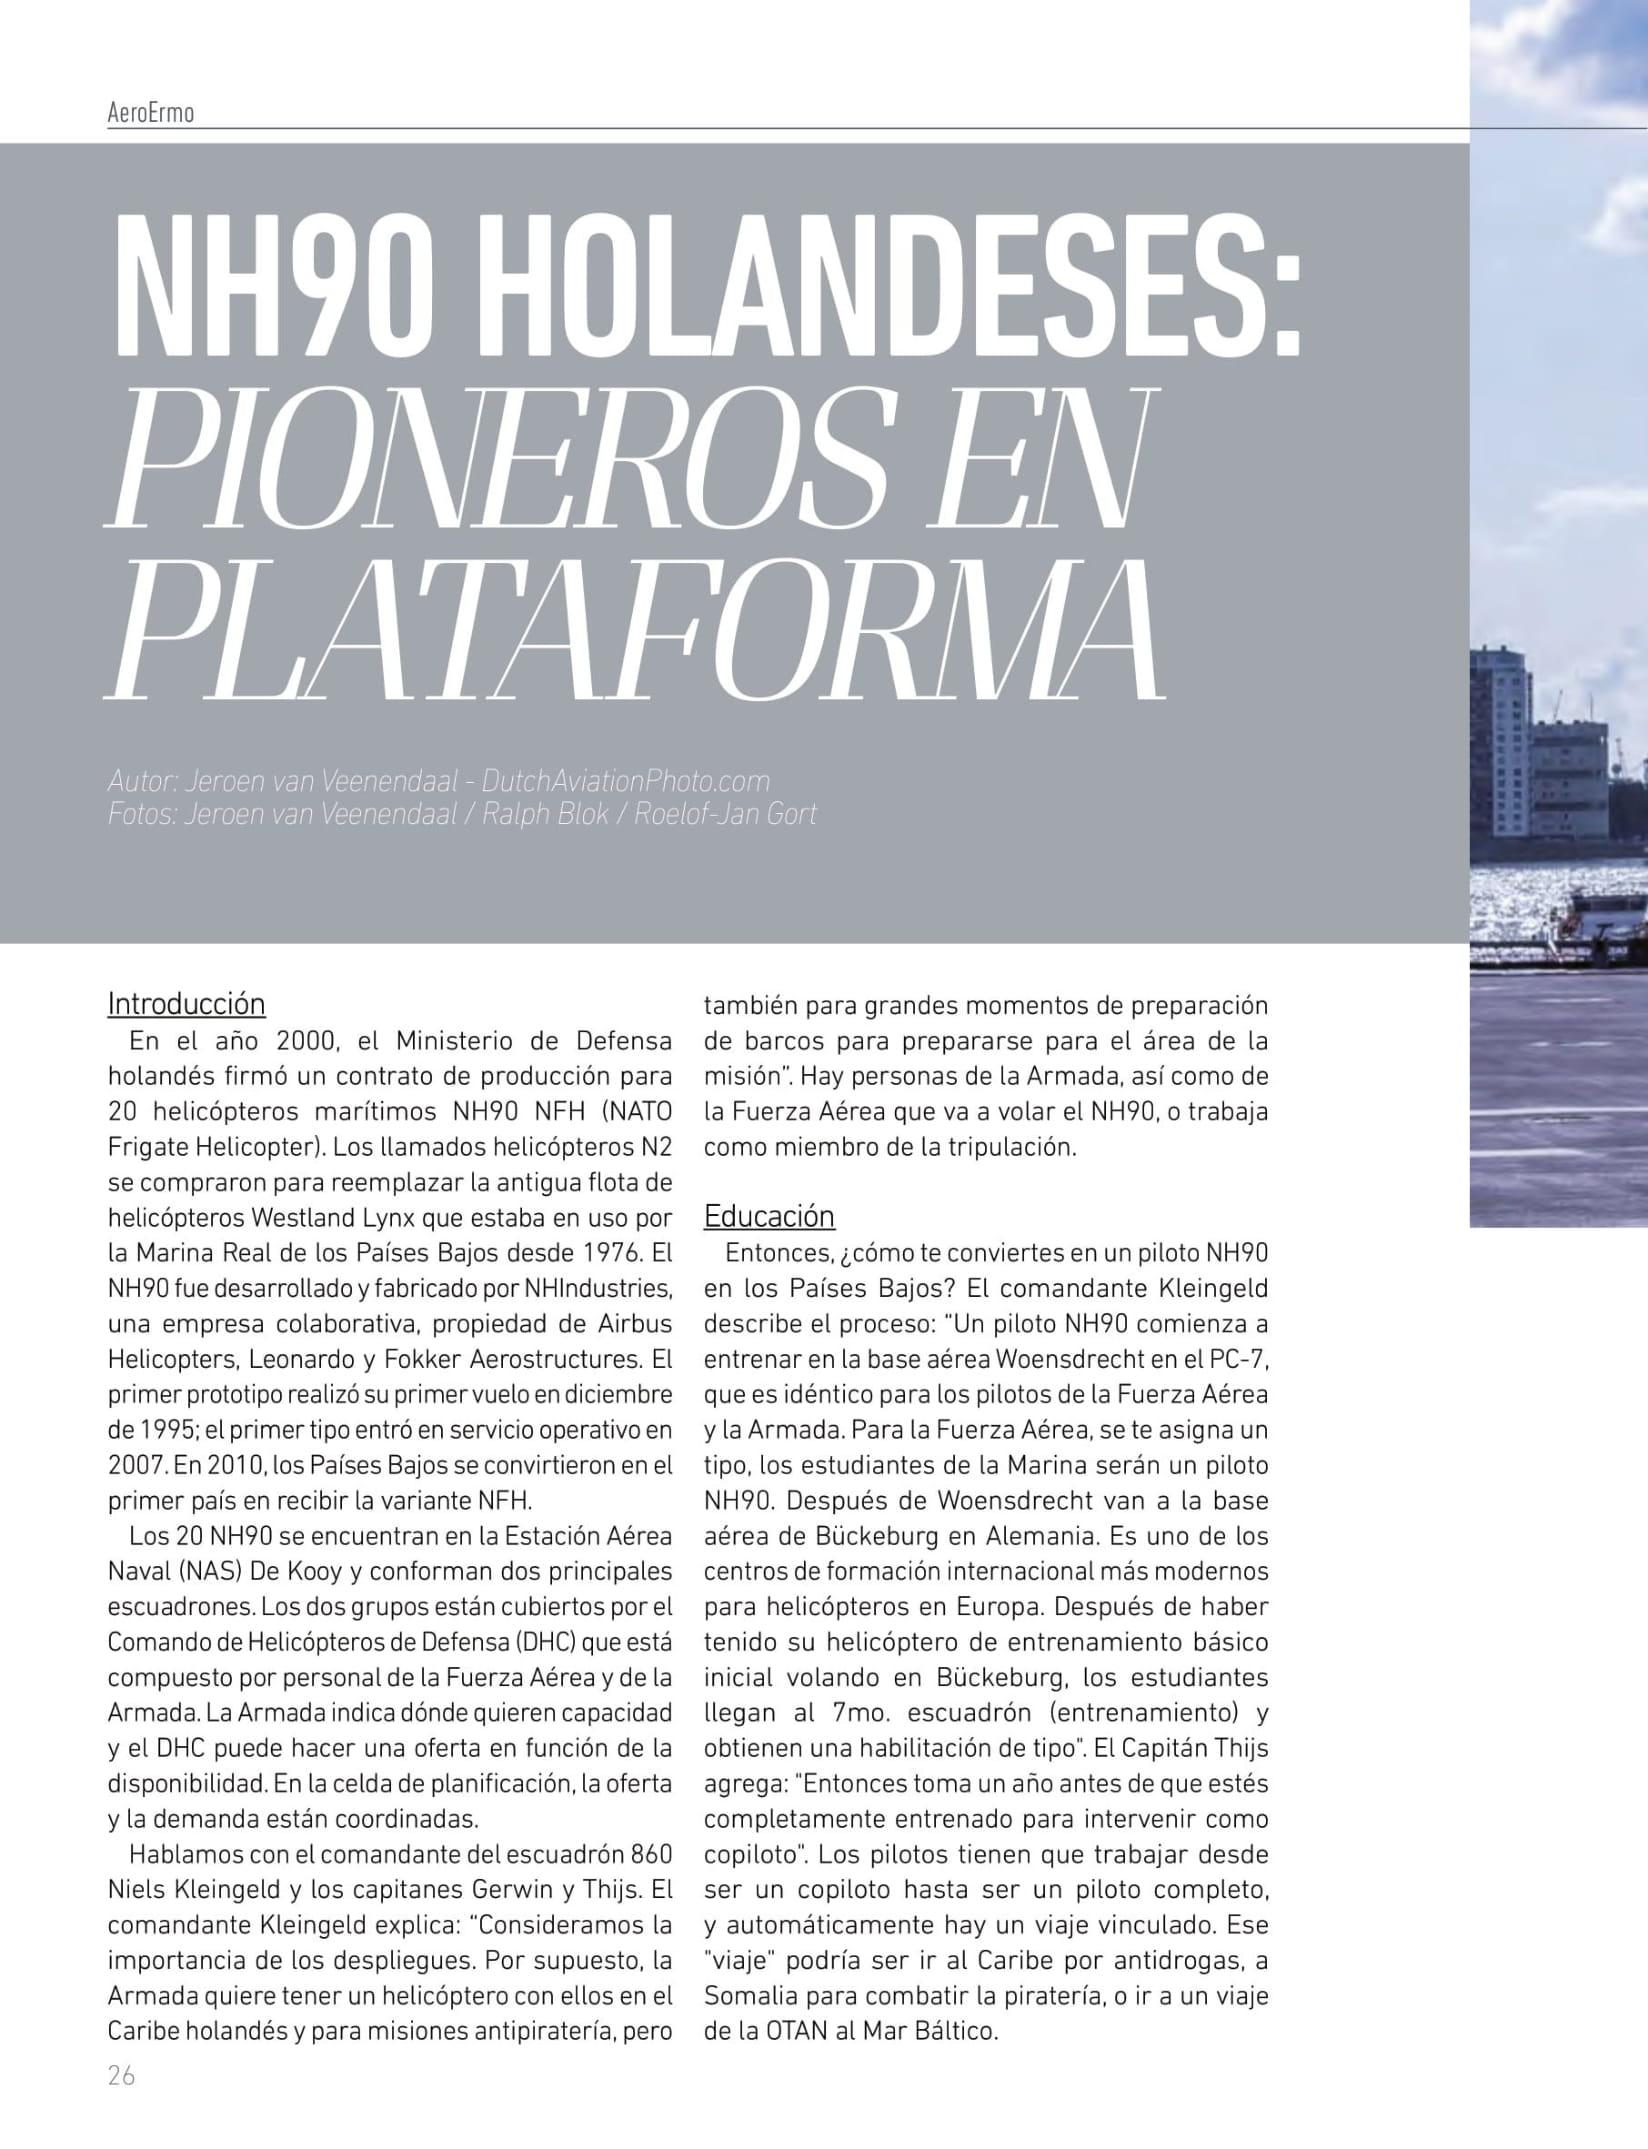 AeroErmo Revista (Colombia)_Dutch NH90s-04